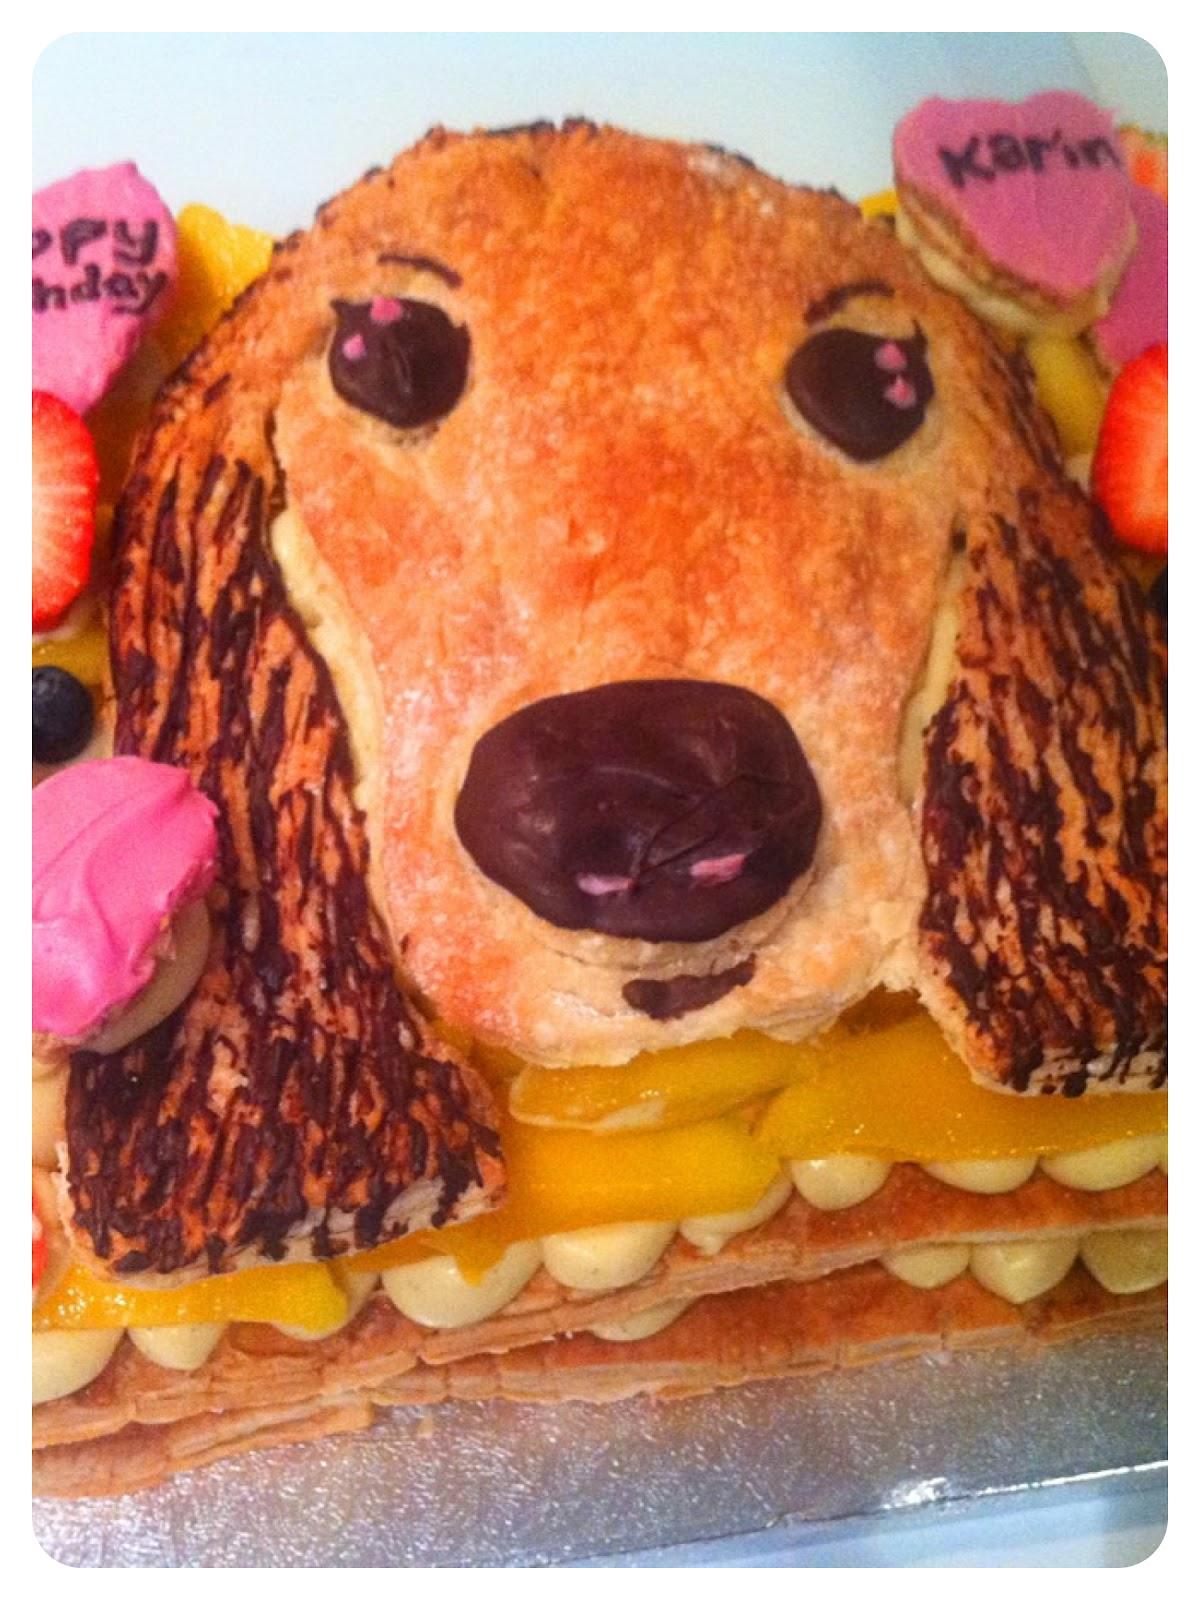 Mango Millefeuilles (Napoleons) Birthday Cake London Cherie Kelly